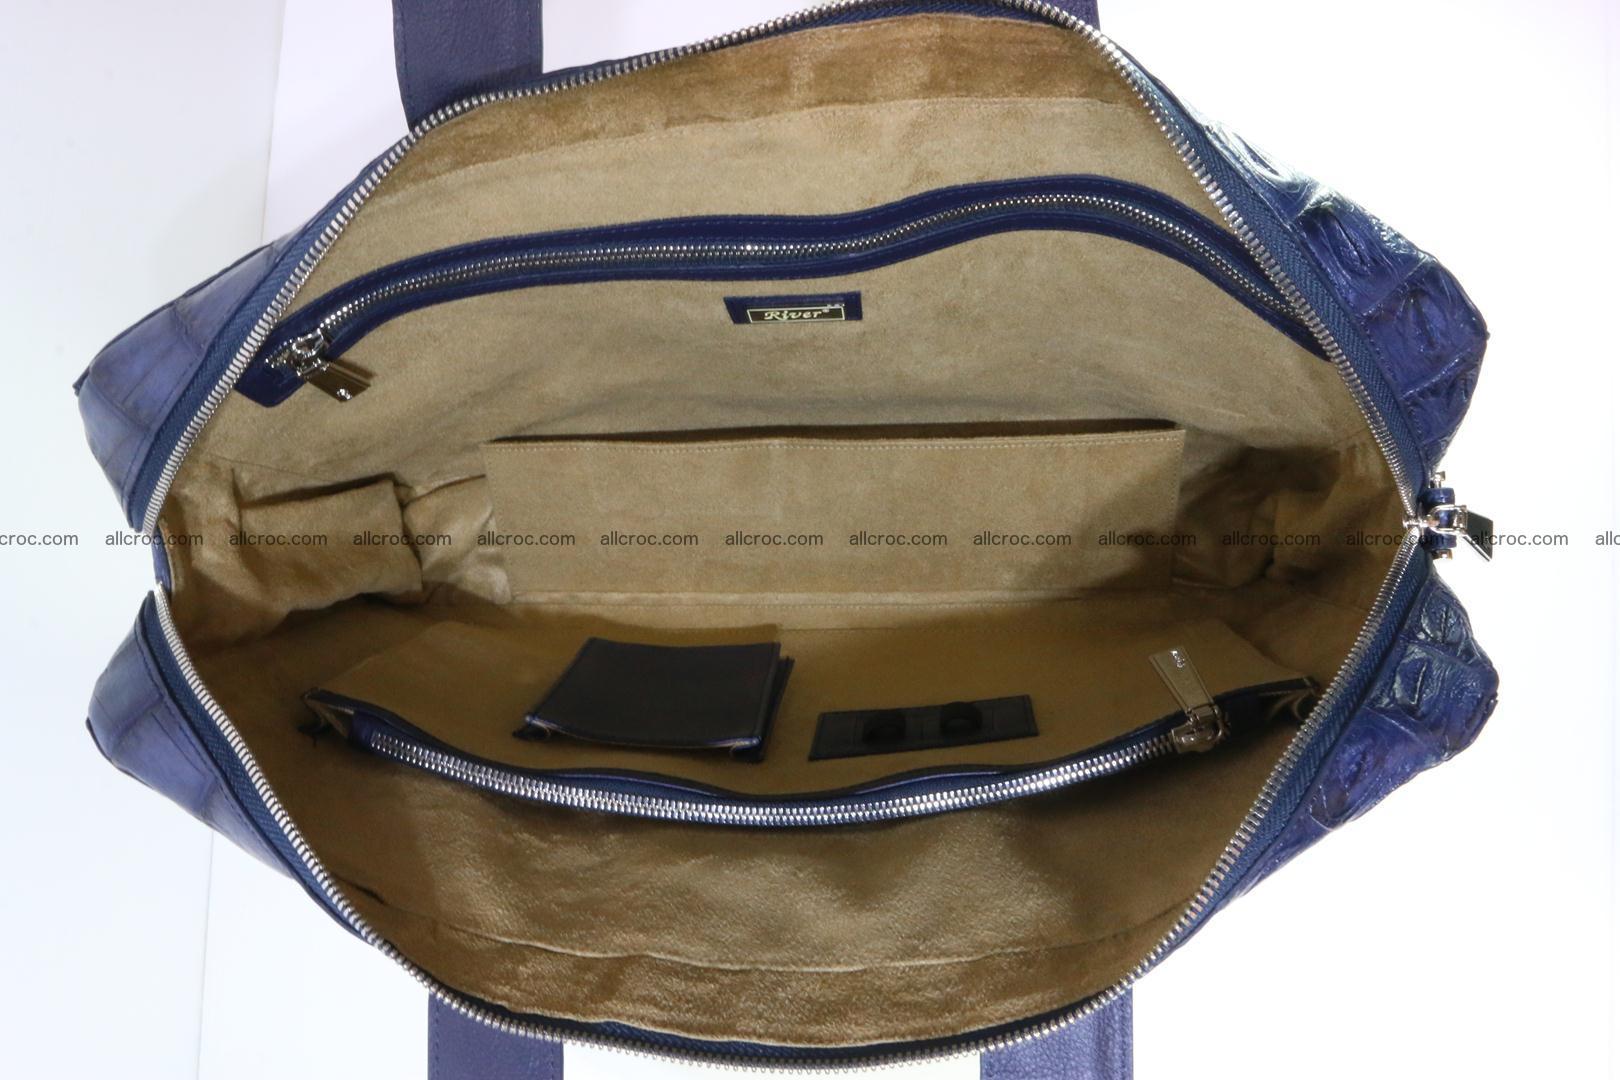 Crocodile skin handbag 423 Foto 12